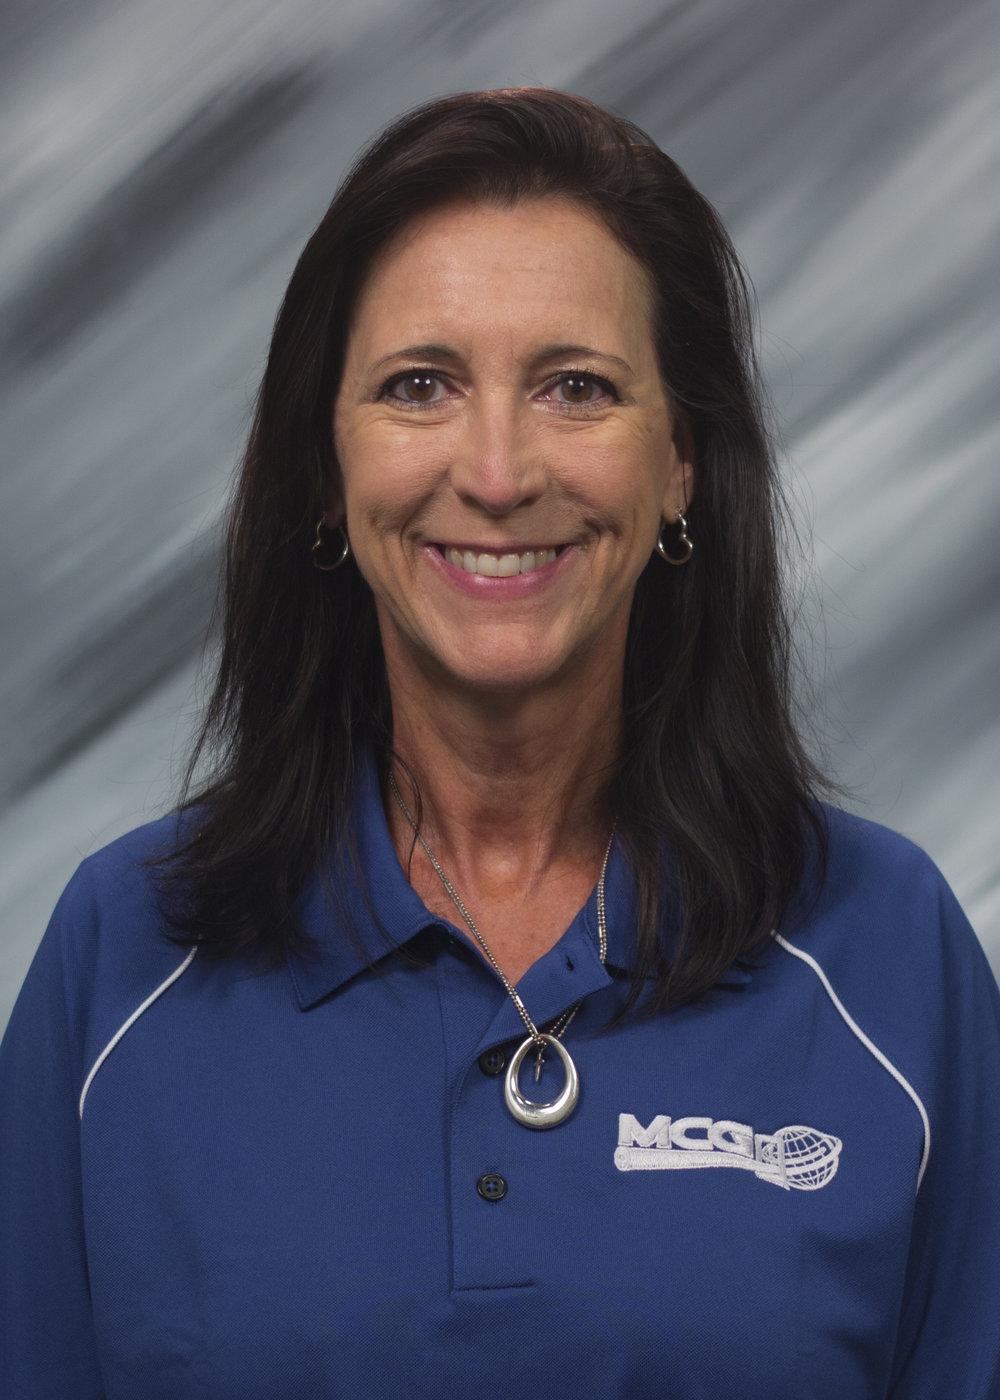 Lorrie Klawonn, Customer Service Manager